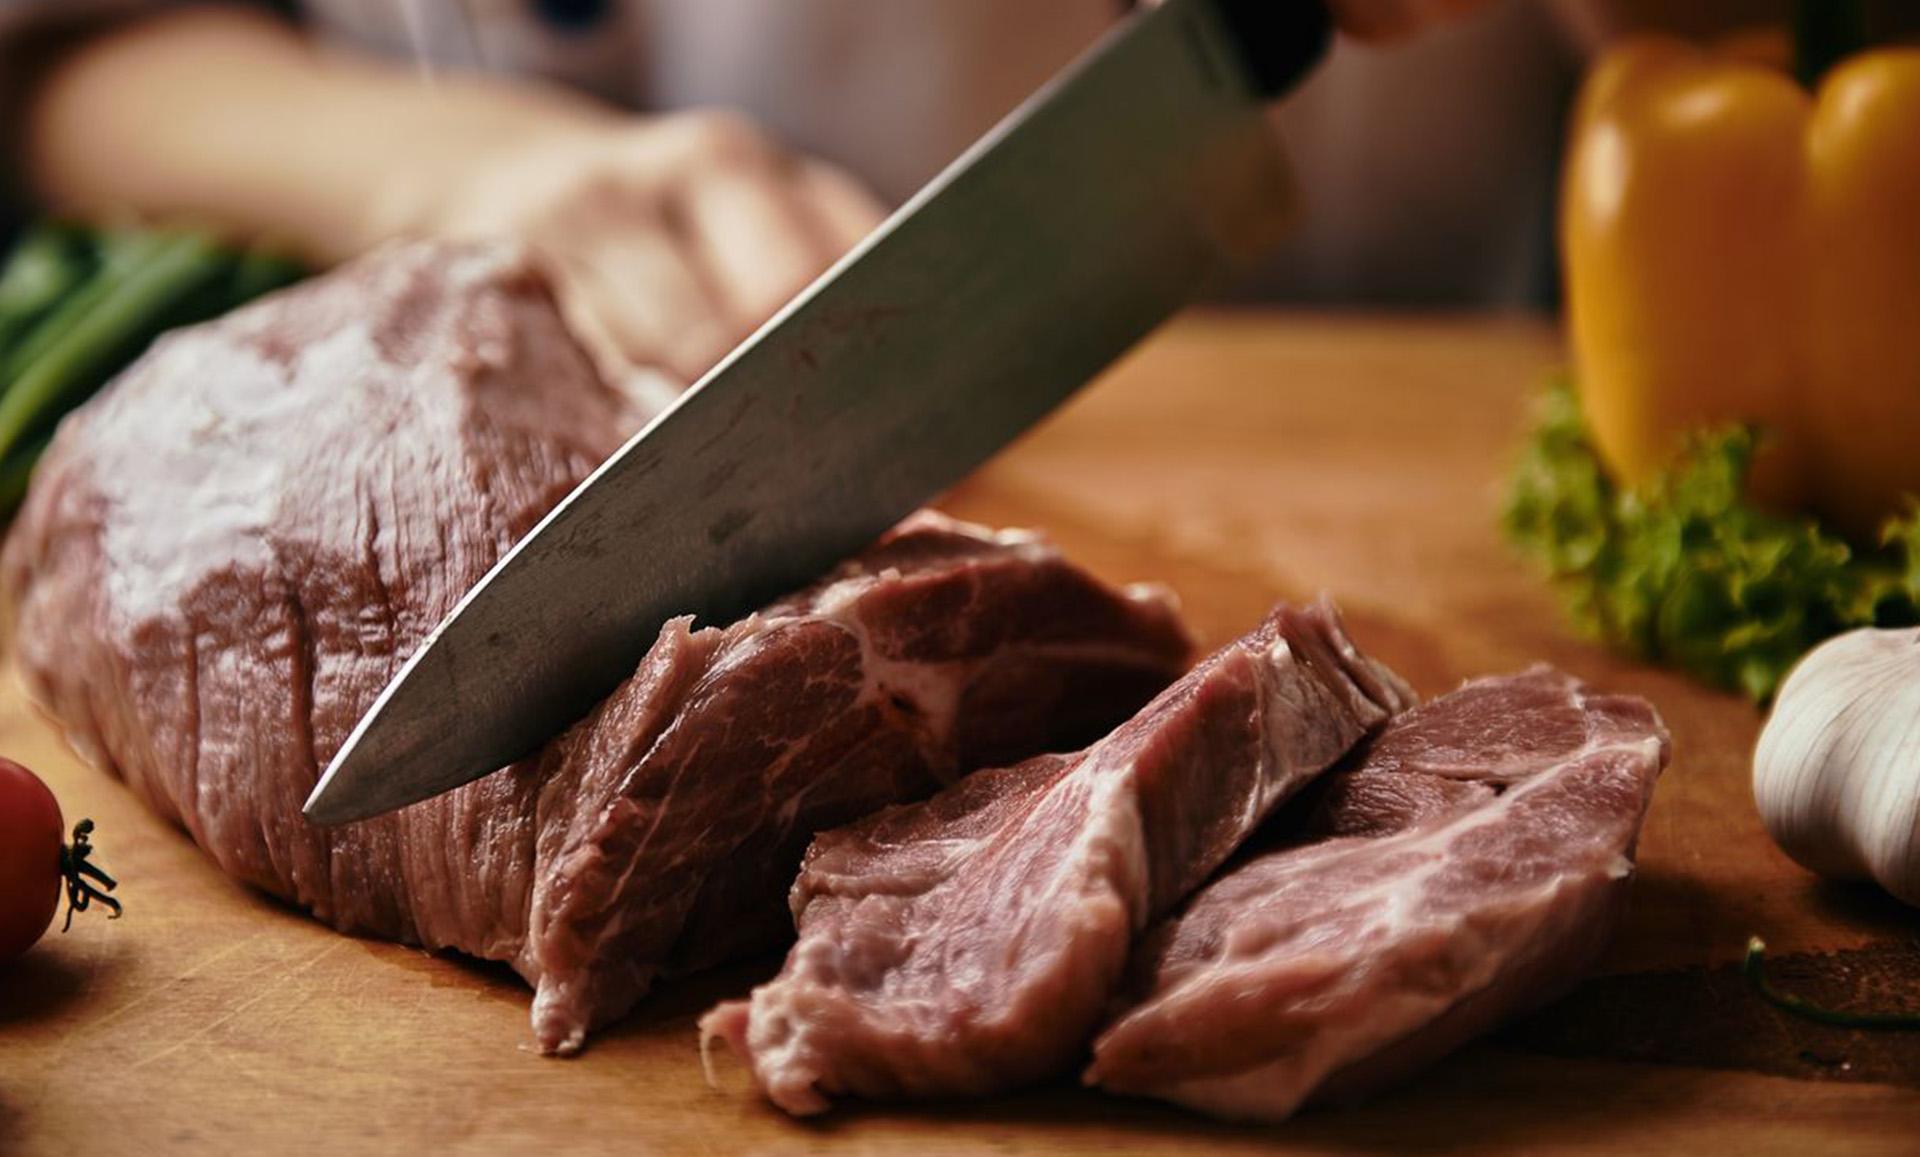 Utensilios cocina chefs guadalajara banner - ACCESORIOS